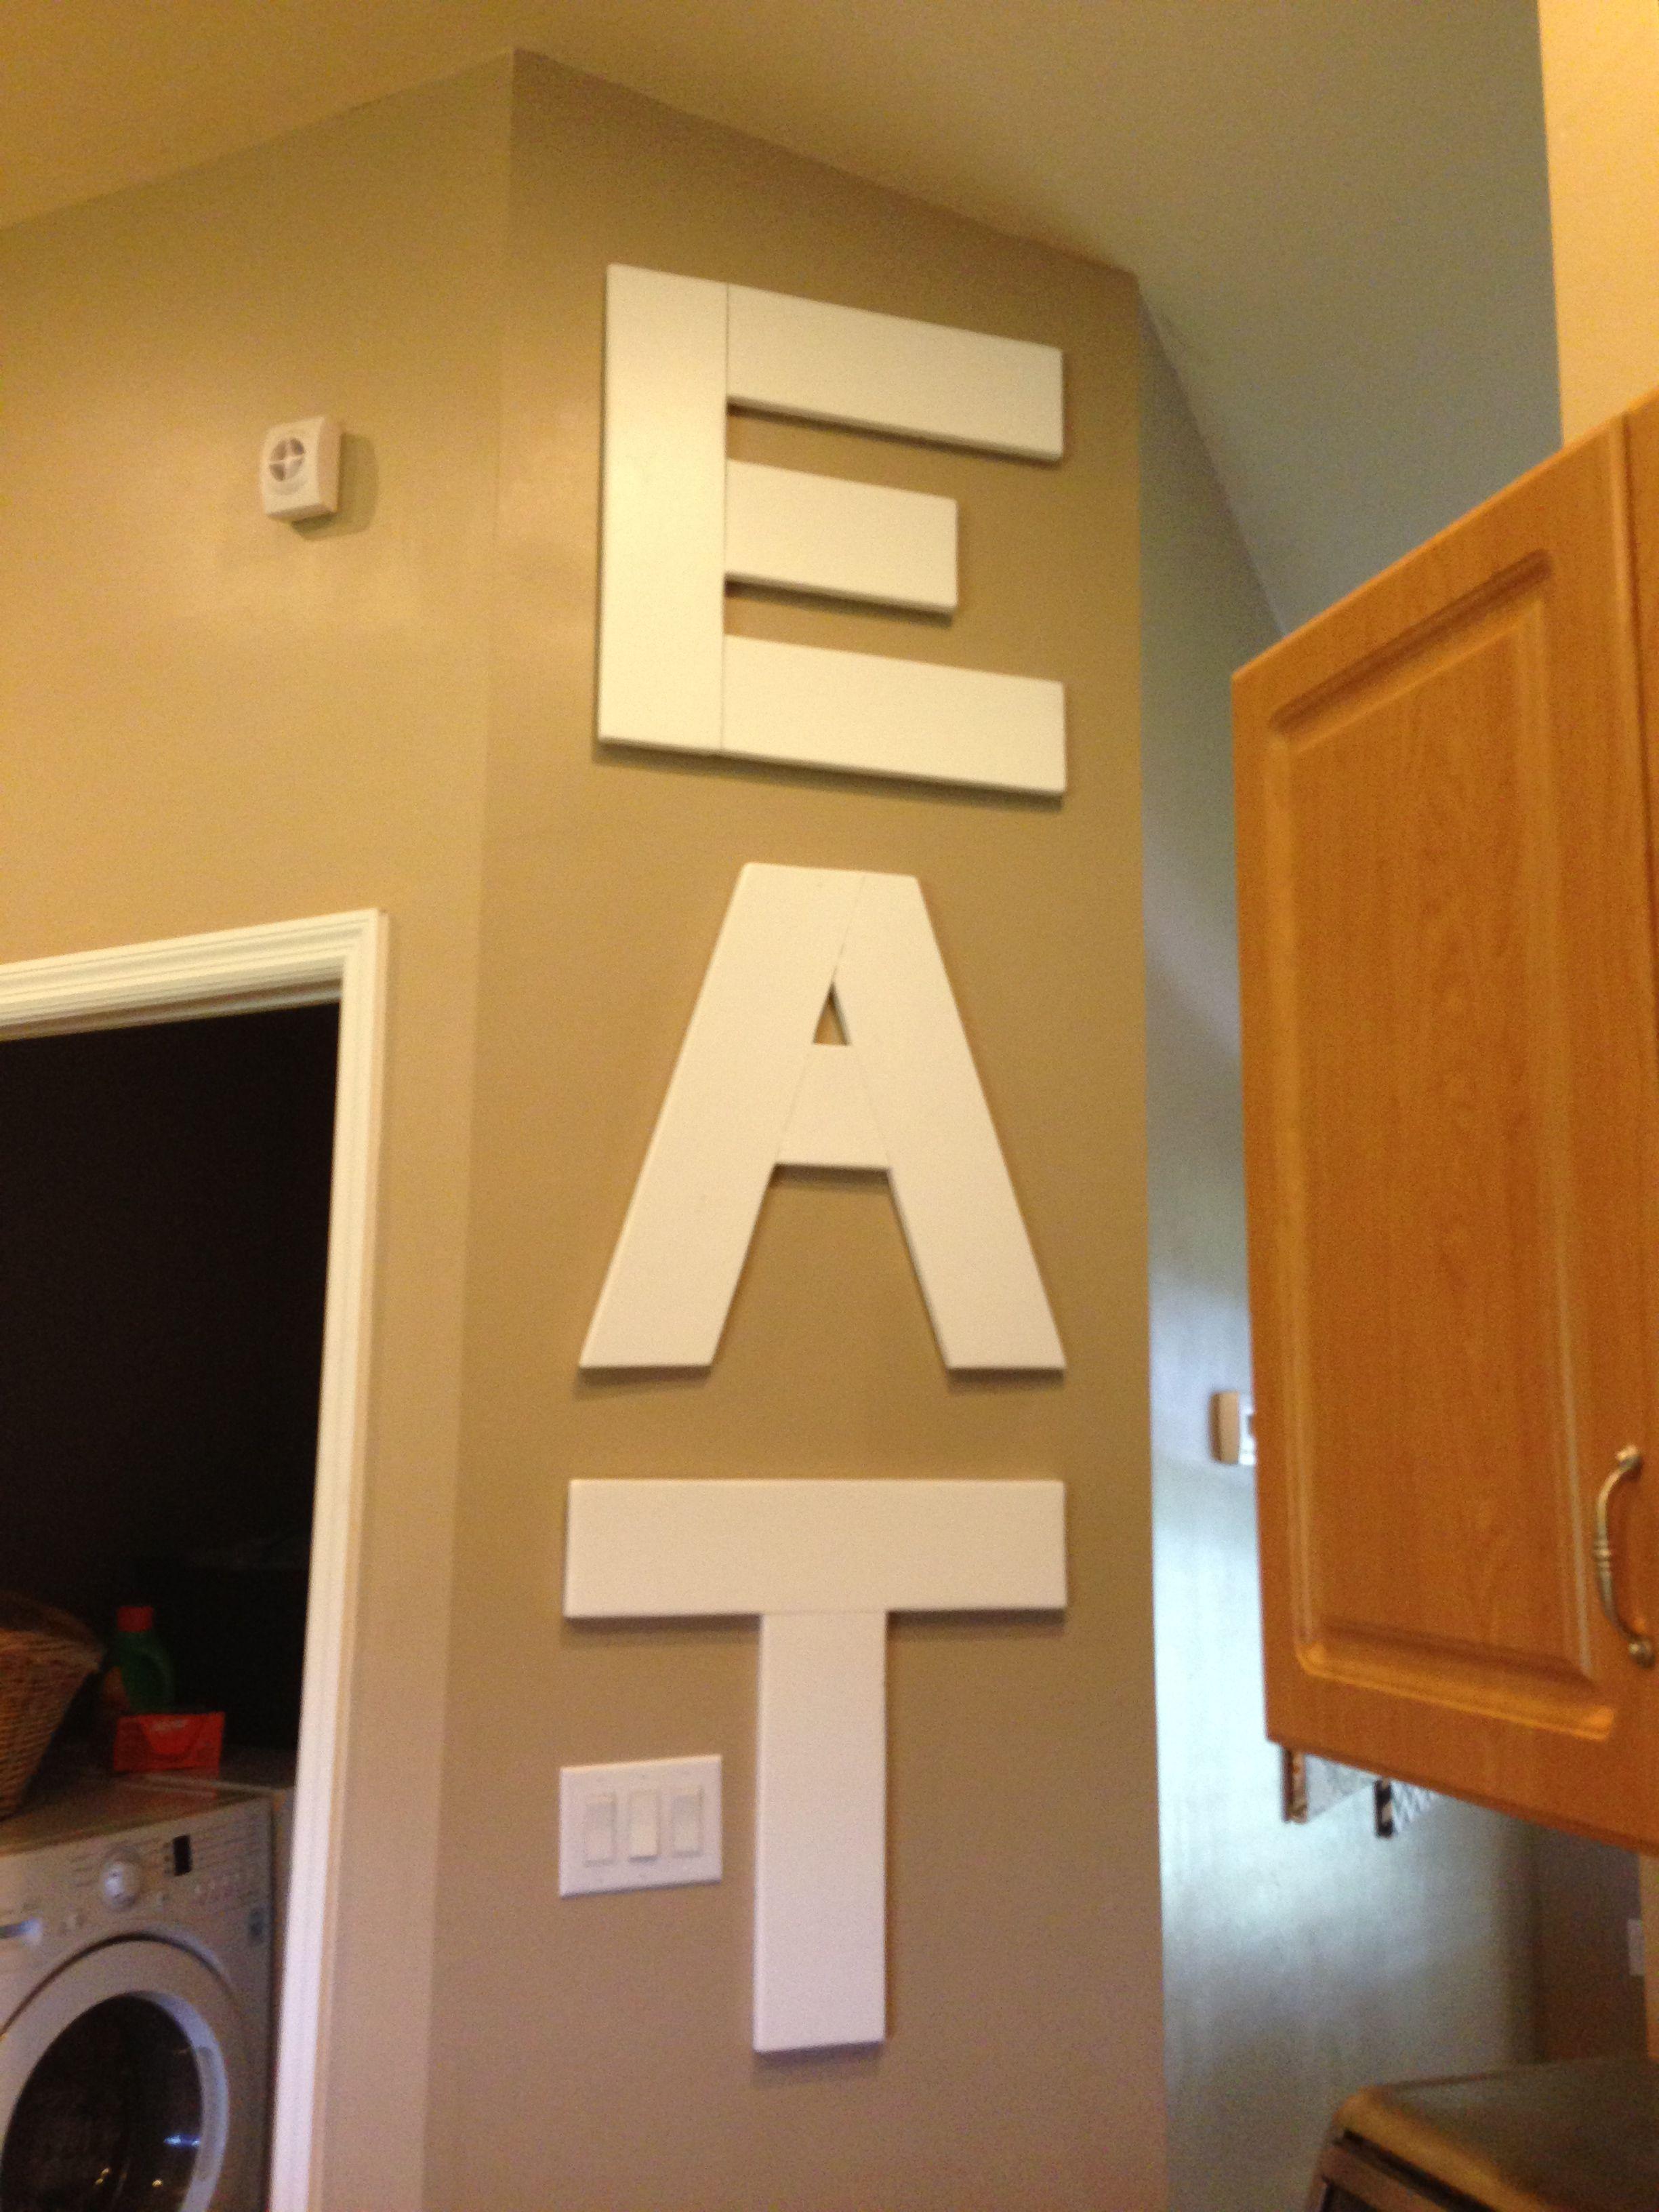 Diy Wood Panel Kitchen Eat Wall Decor Wall Decor Wood